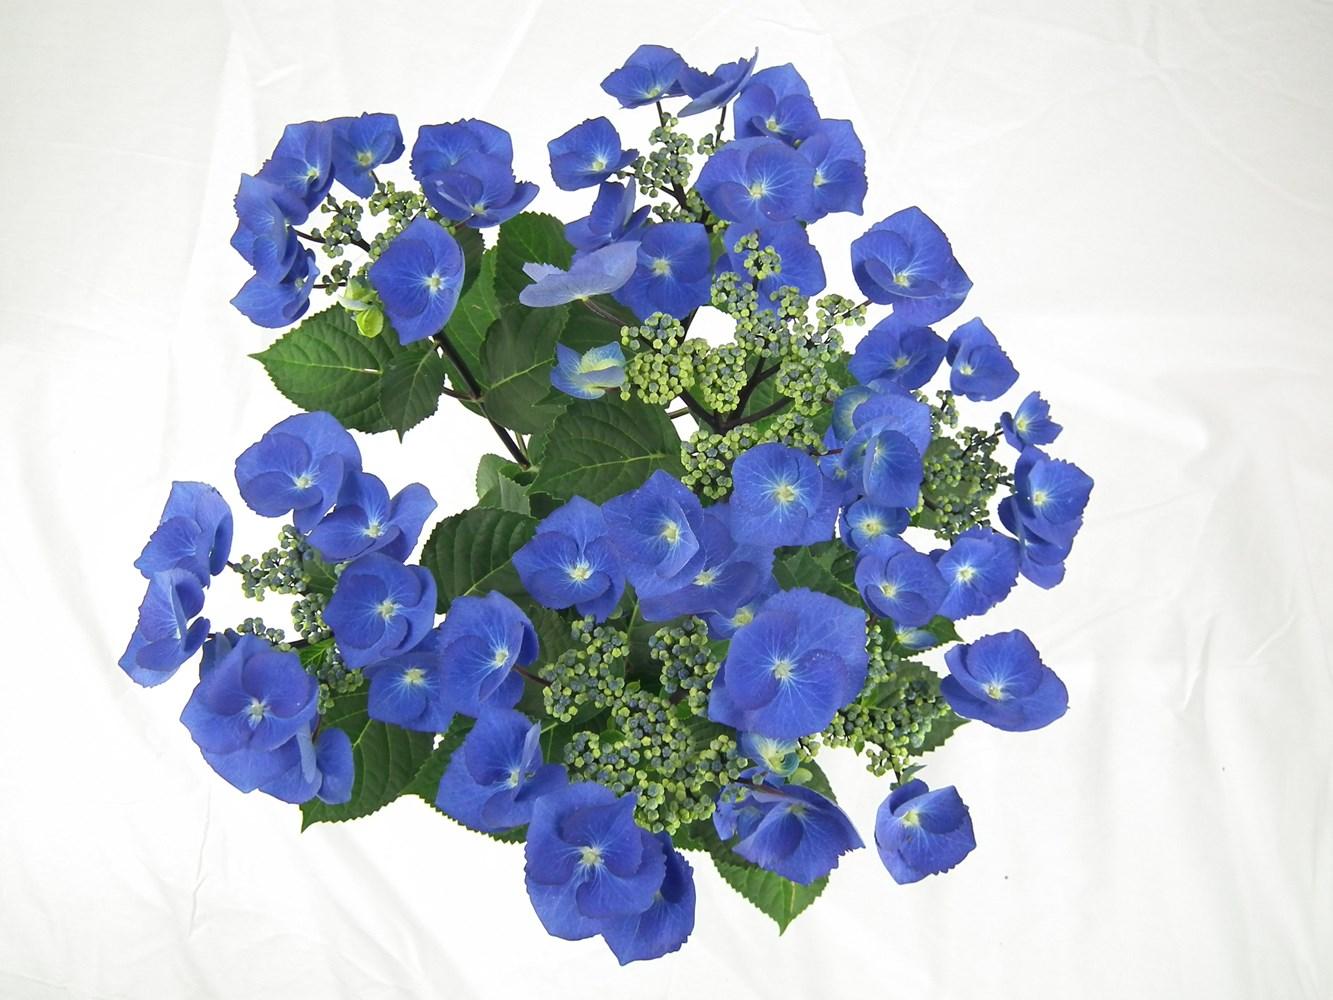 Website/Plants/2144398571/Images/Gallery/h_blacklace_01.0.JPG